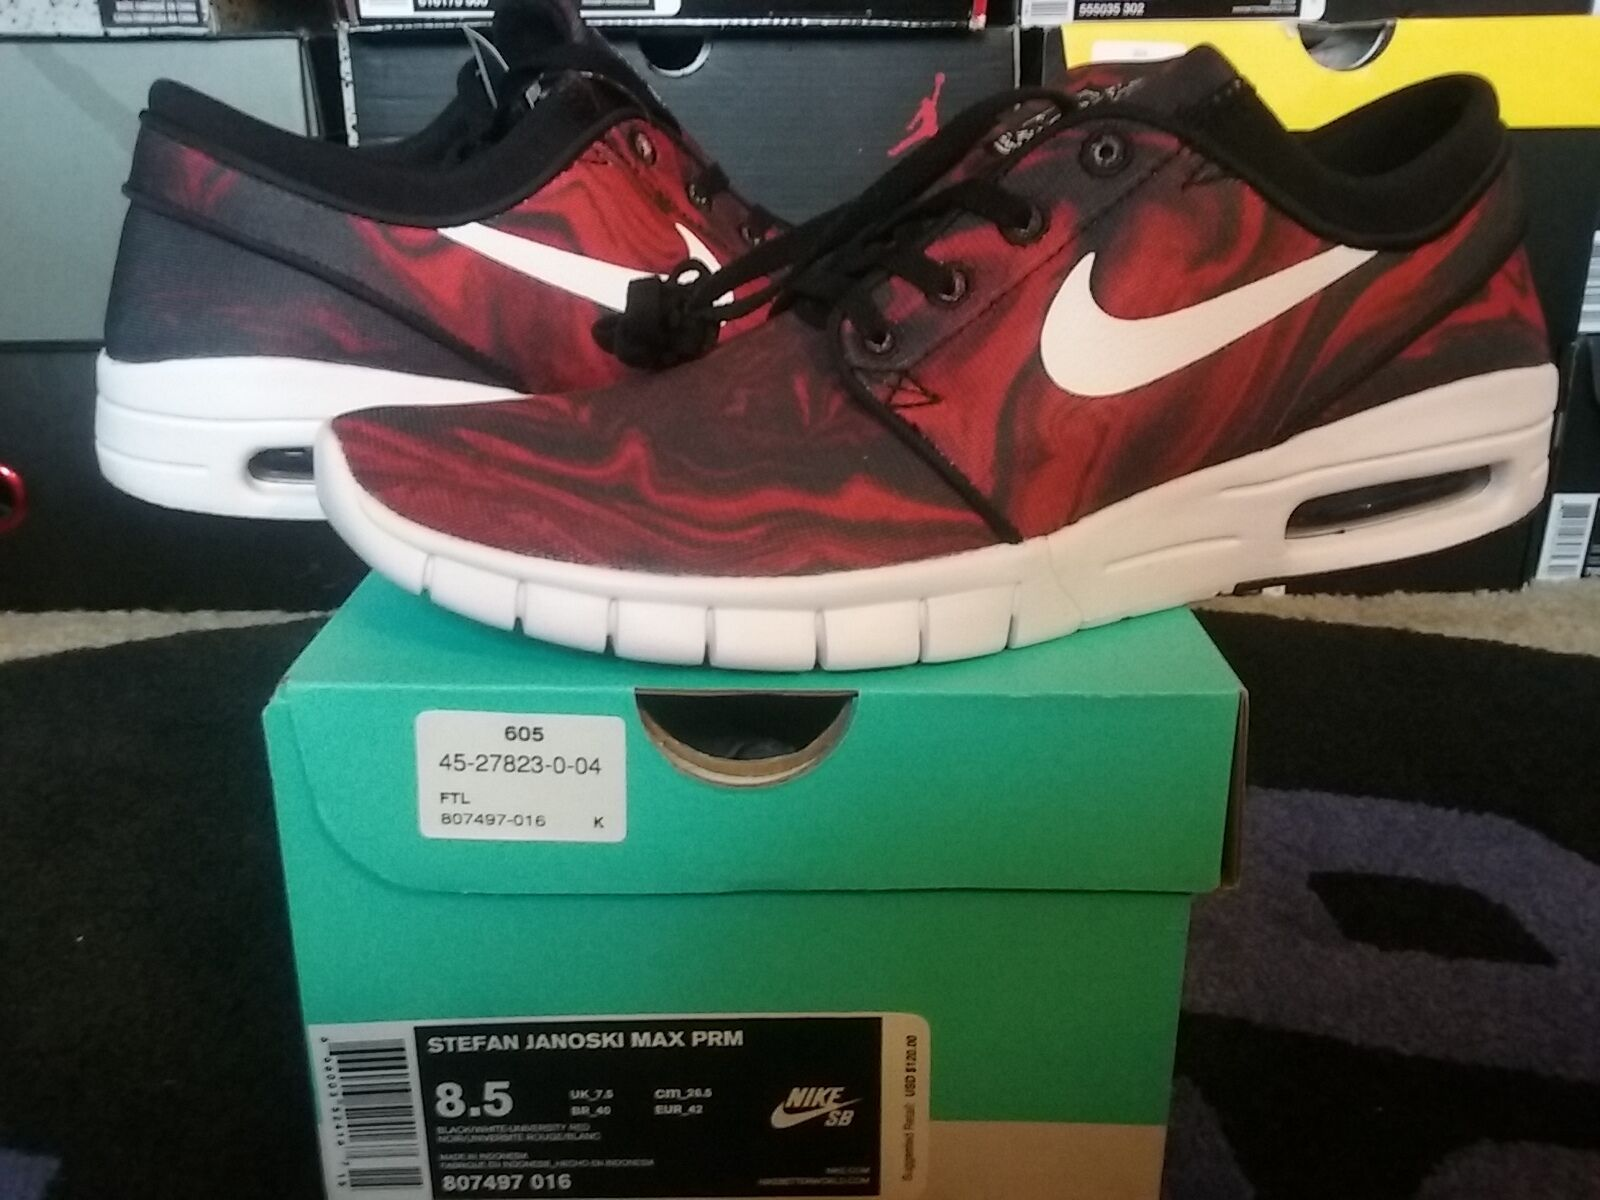 Nike Air Zoom Stefan Janoski Max Premium PRM SB Black White Red mid l 807497 016